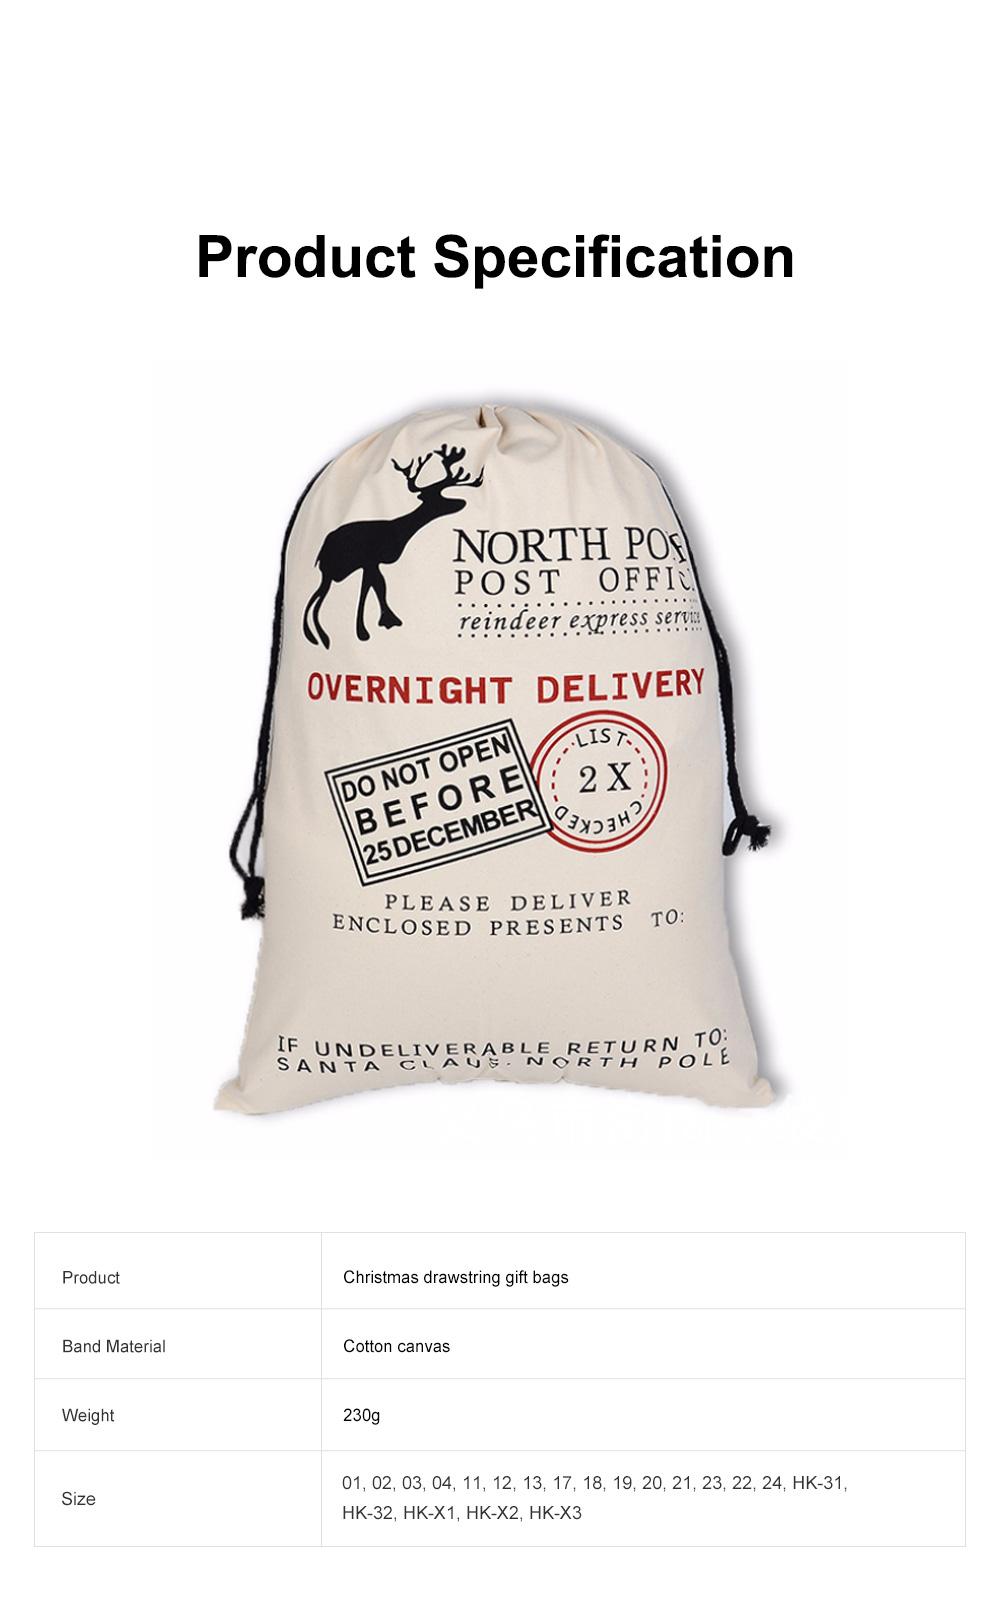 Cheap Recycled Reusable Plain White Organic Calico Cotton Canvas Christmas Drawstring Gift Bags Storage Bag 6